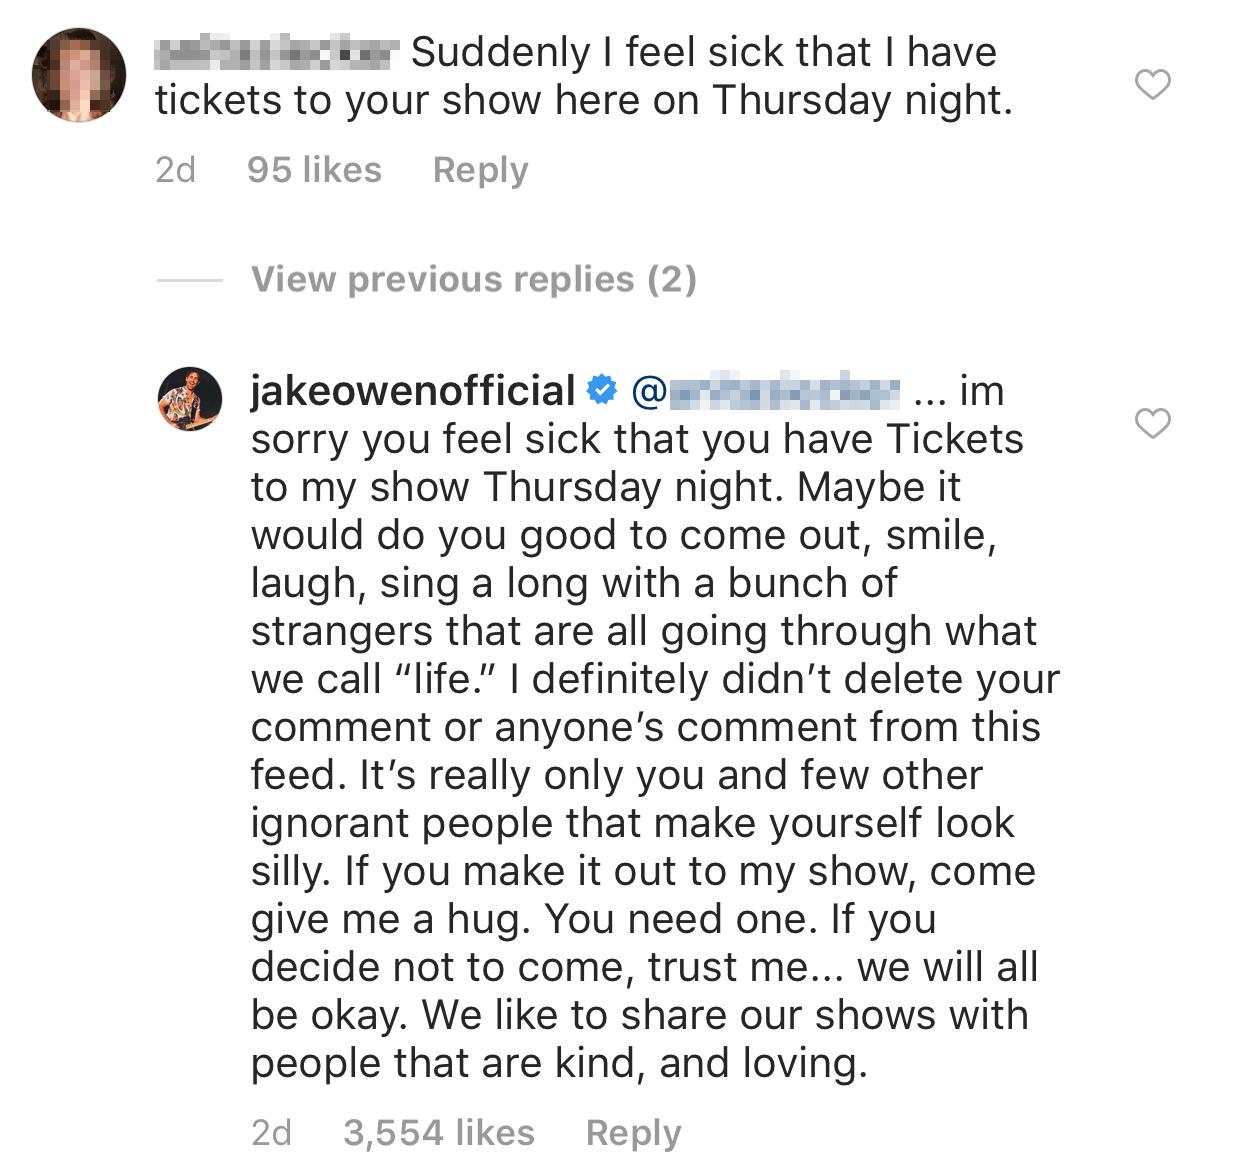 Jake-Owen-Claps-Back-at-Anti-LGBTQ-Commenter